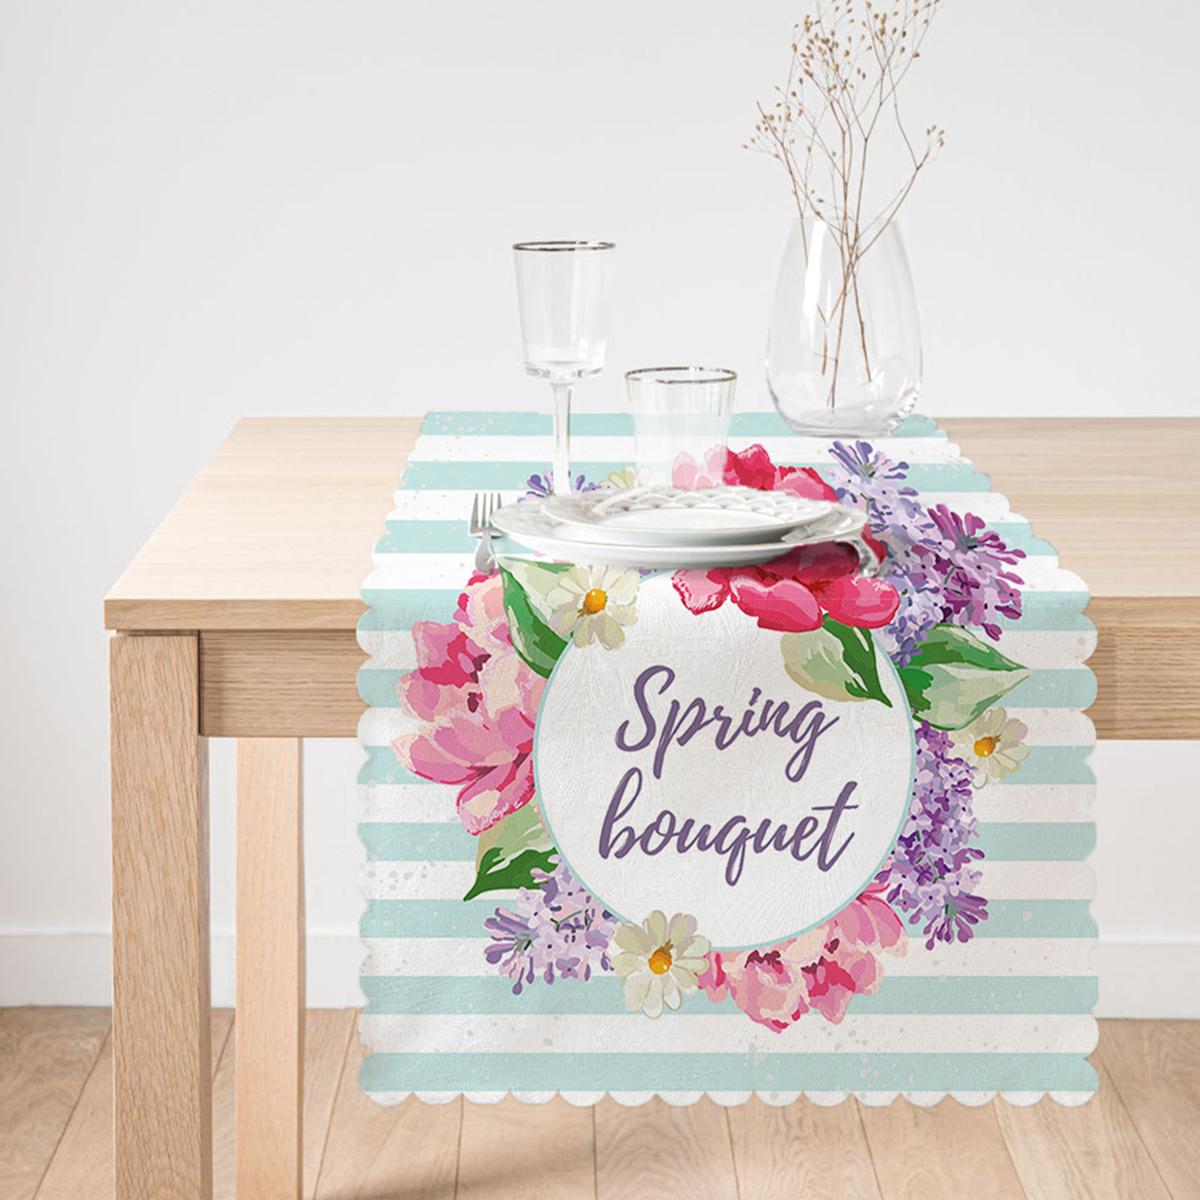 Spring Bouquet Temalı Modern Dijital Baskılı Runner Realhomes